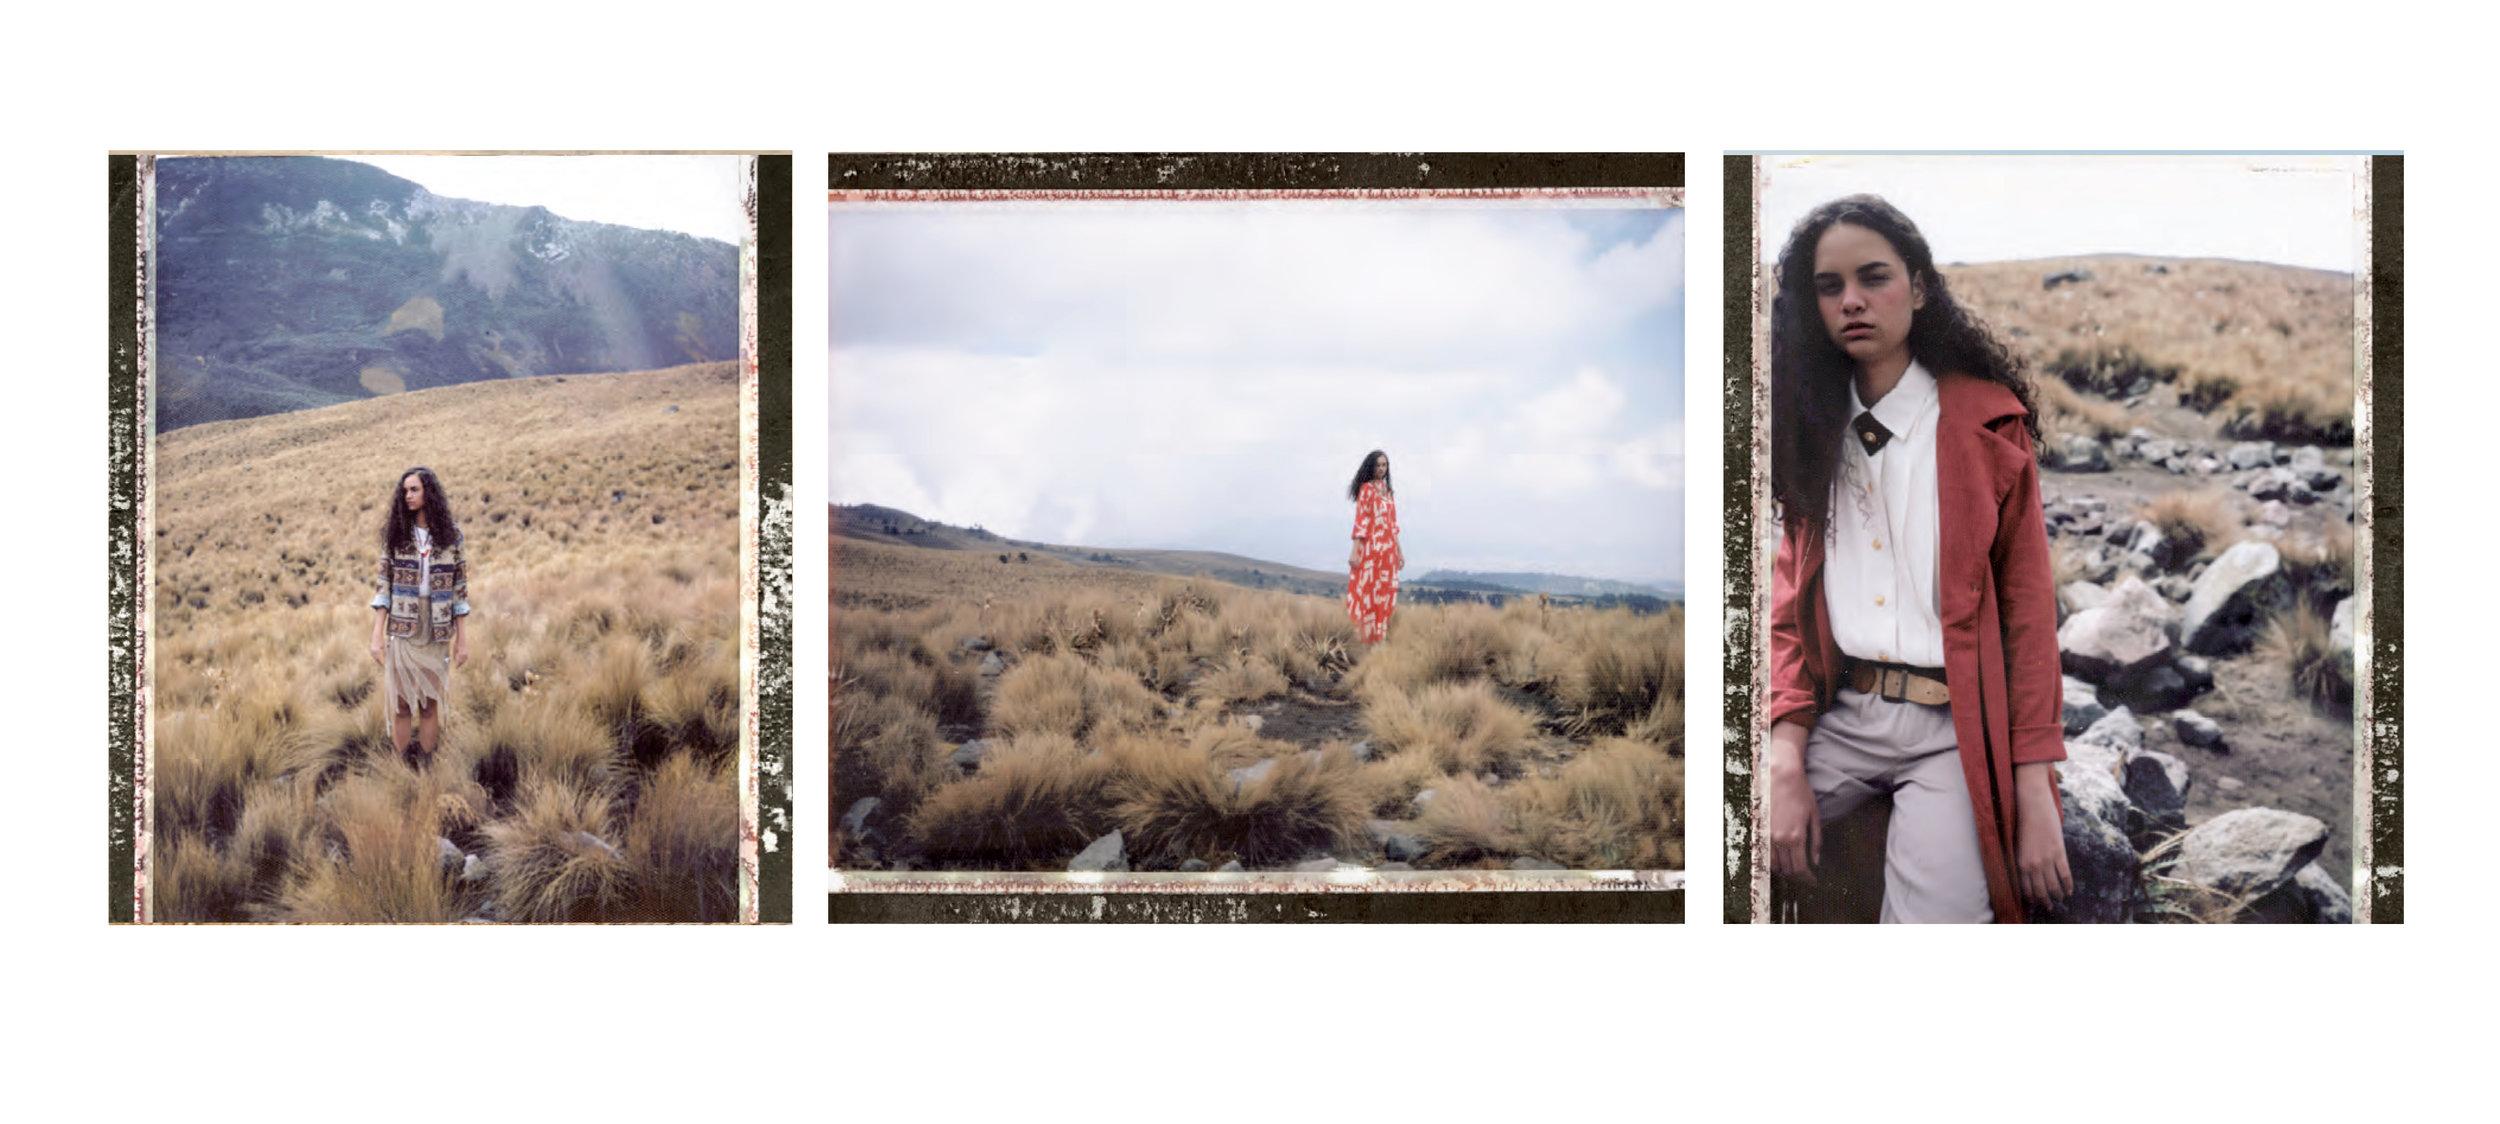 Marie-Claire-Mexico-April-2018-57.jpg